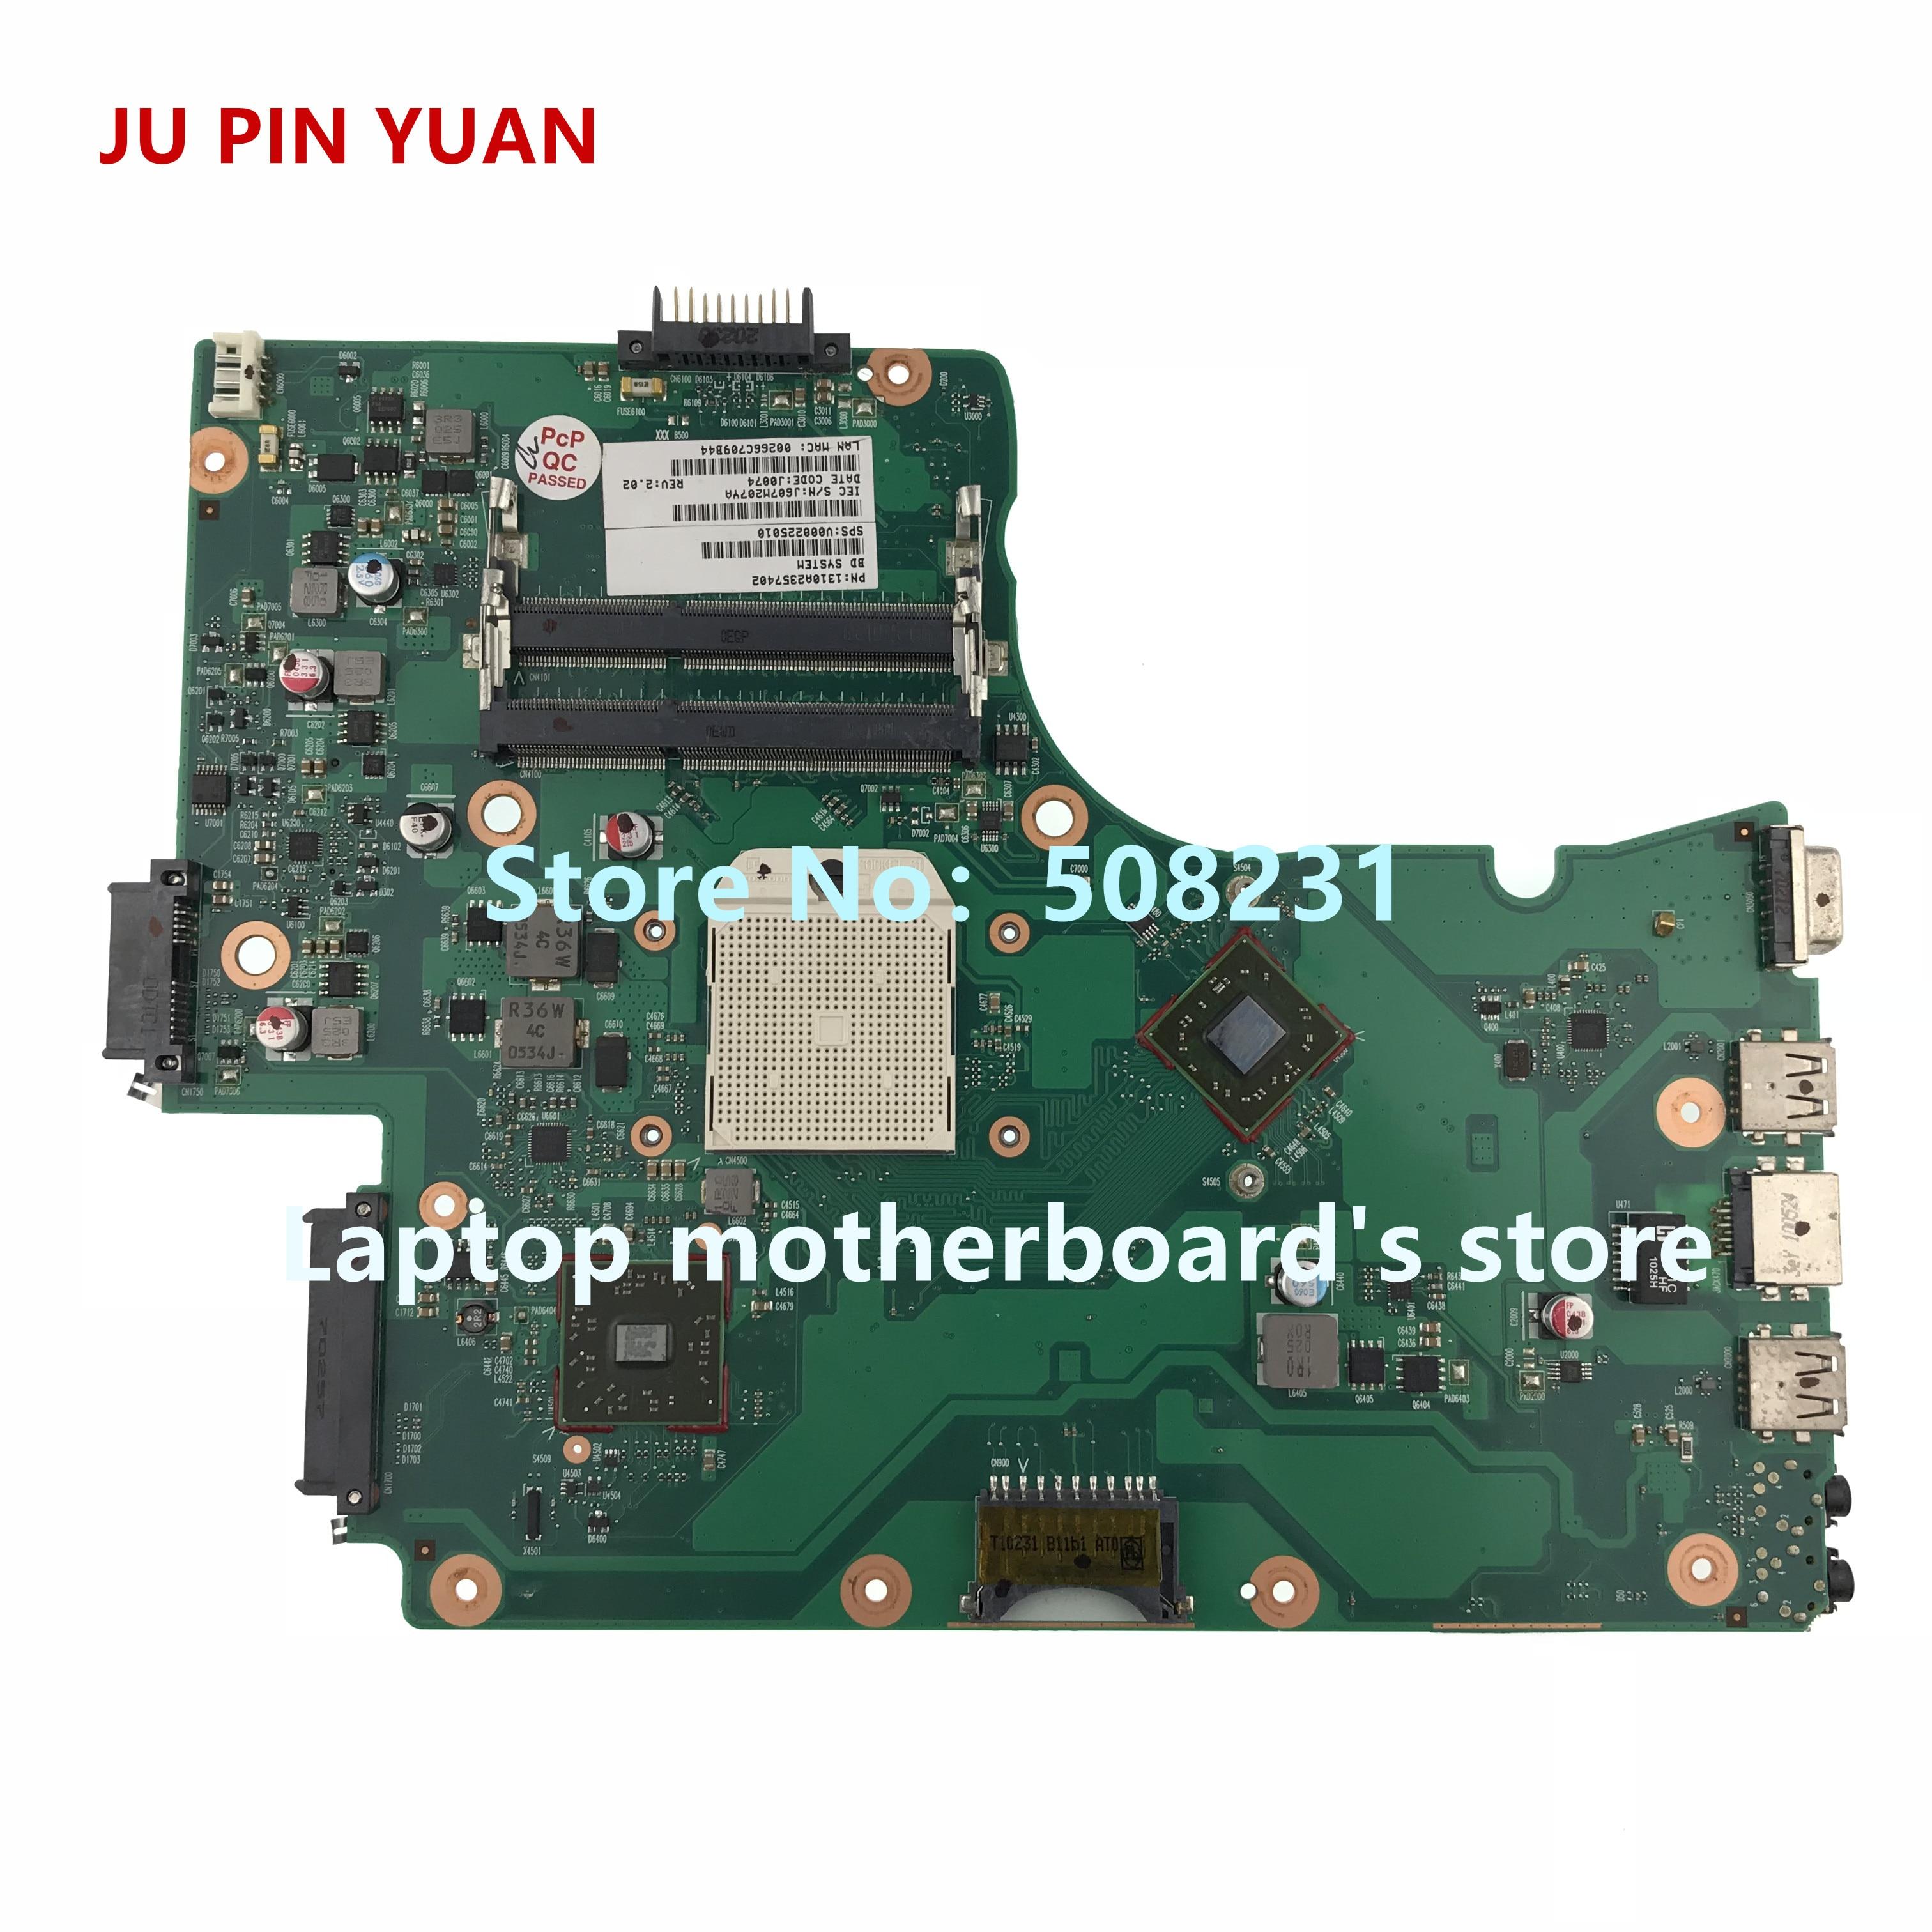 JU PIN YUAN V000225010 mainboard For Toshiba Satellite C650D C655D laptop motherboard 6050A2357401-MB-A02JU PIN YUAN V000225010 mainboard For Toshiba Satellite C650D C655D laptop motherboard 6050A2357401-MB-A02